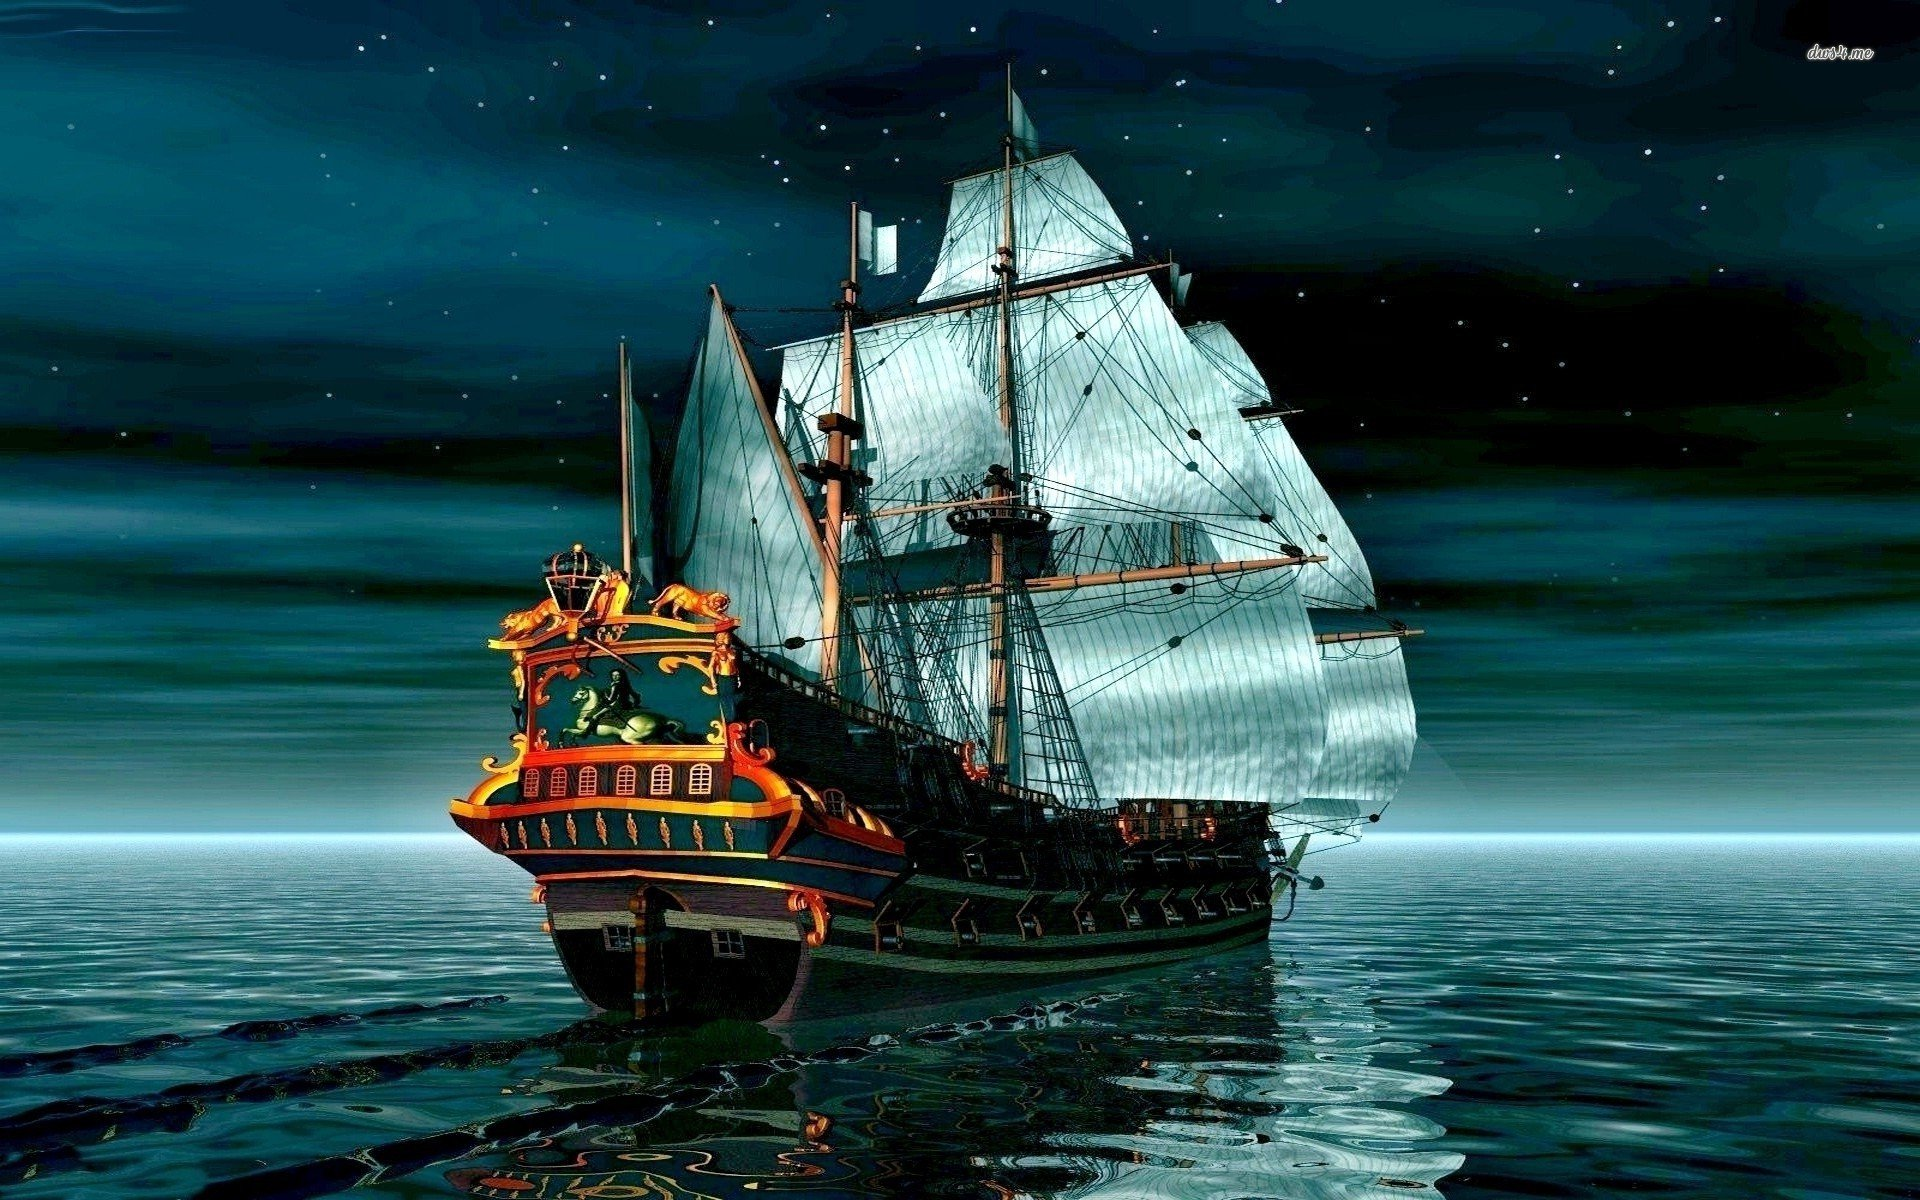 1voojuisland ship boat wallpaper 1920x1200 574170 WallpaperUP 1920x1200